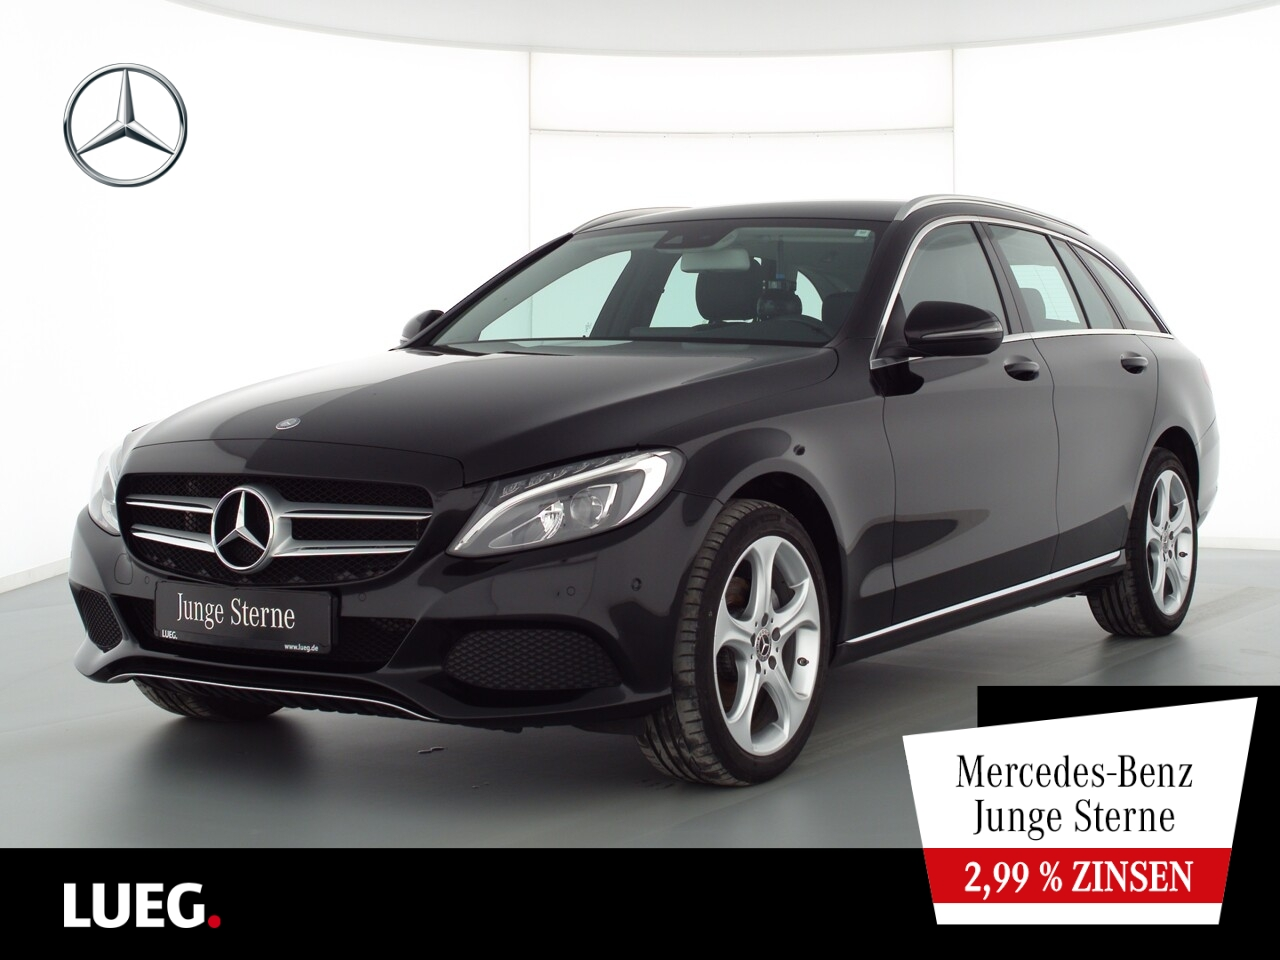 Mercedes-Benz C 200 T 4M Avantgarde+Navi+LED-HP+Sthzg+ParkAss+, Jahr 2017, Benzin